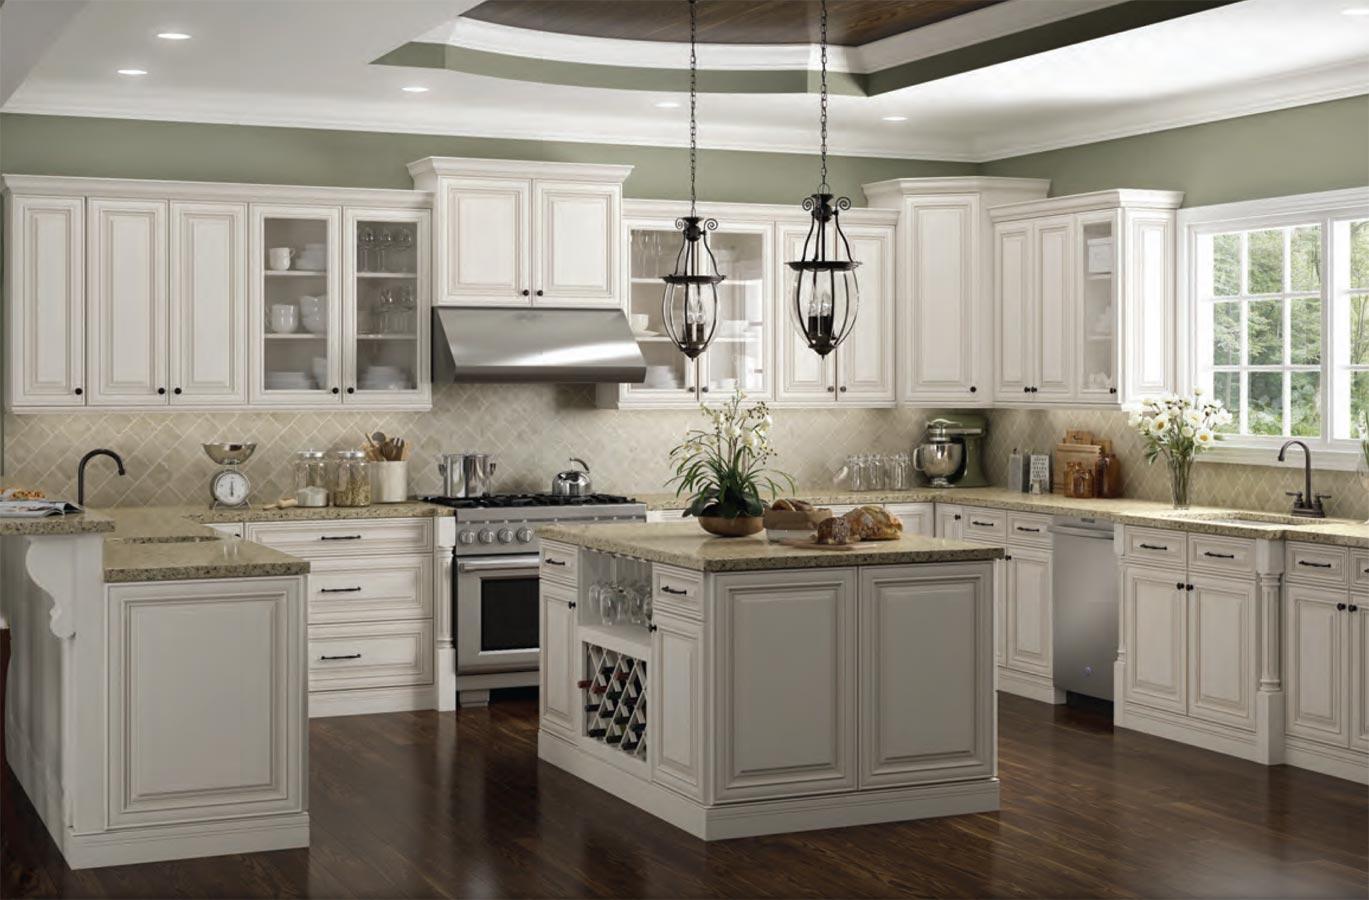 Charleston Antique White Kitchen Cabinates Photos, Pictures